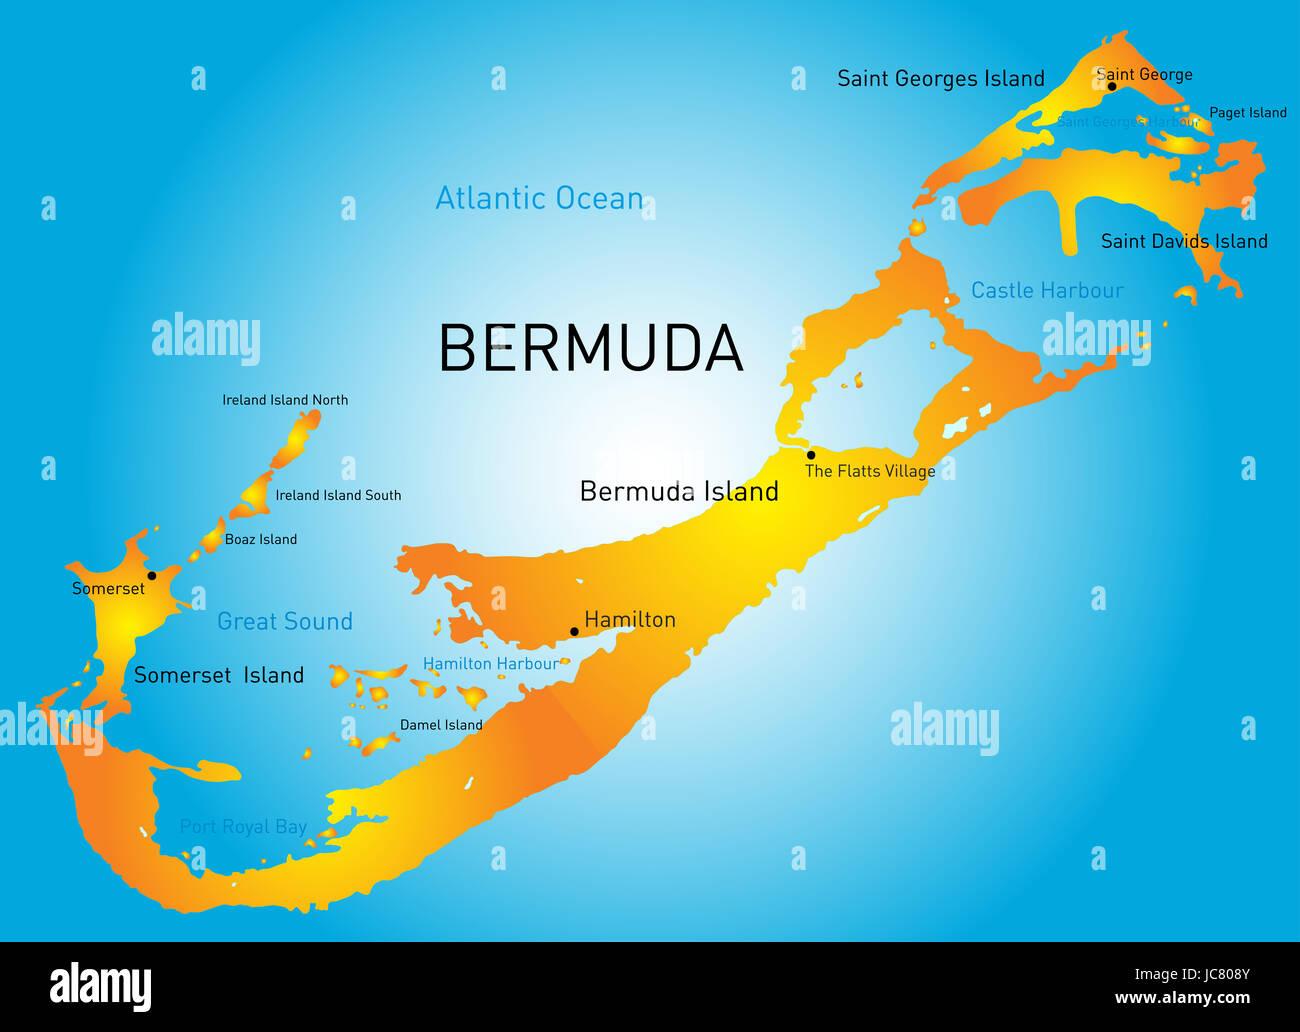 Vector map of Bermuda region Stock Photo